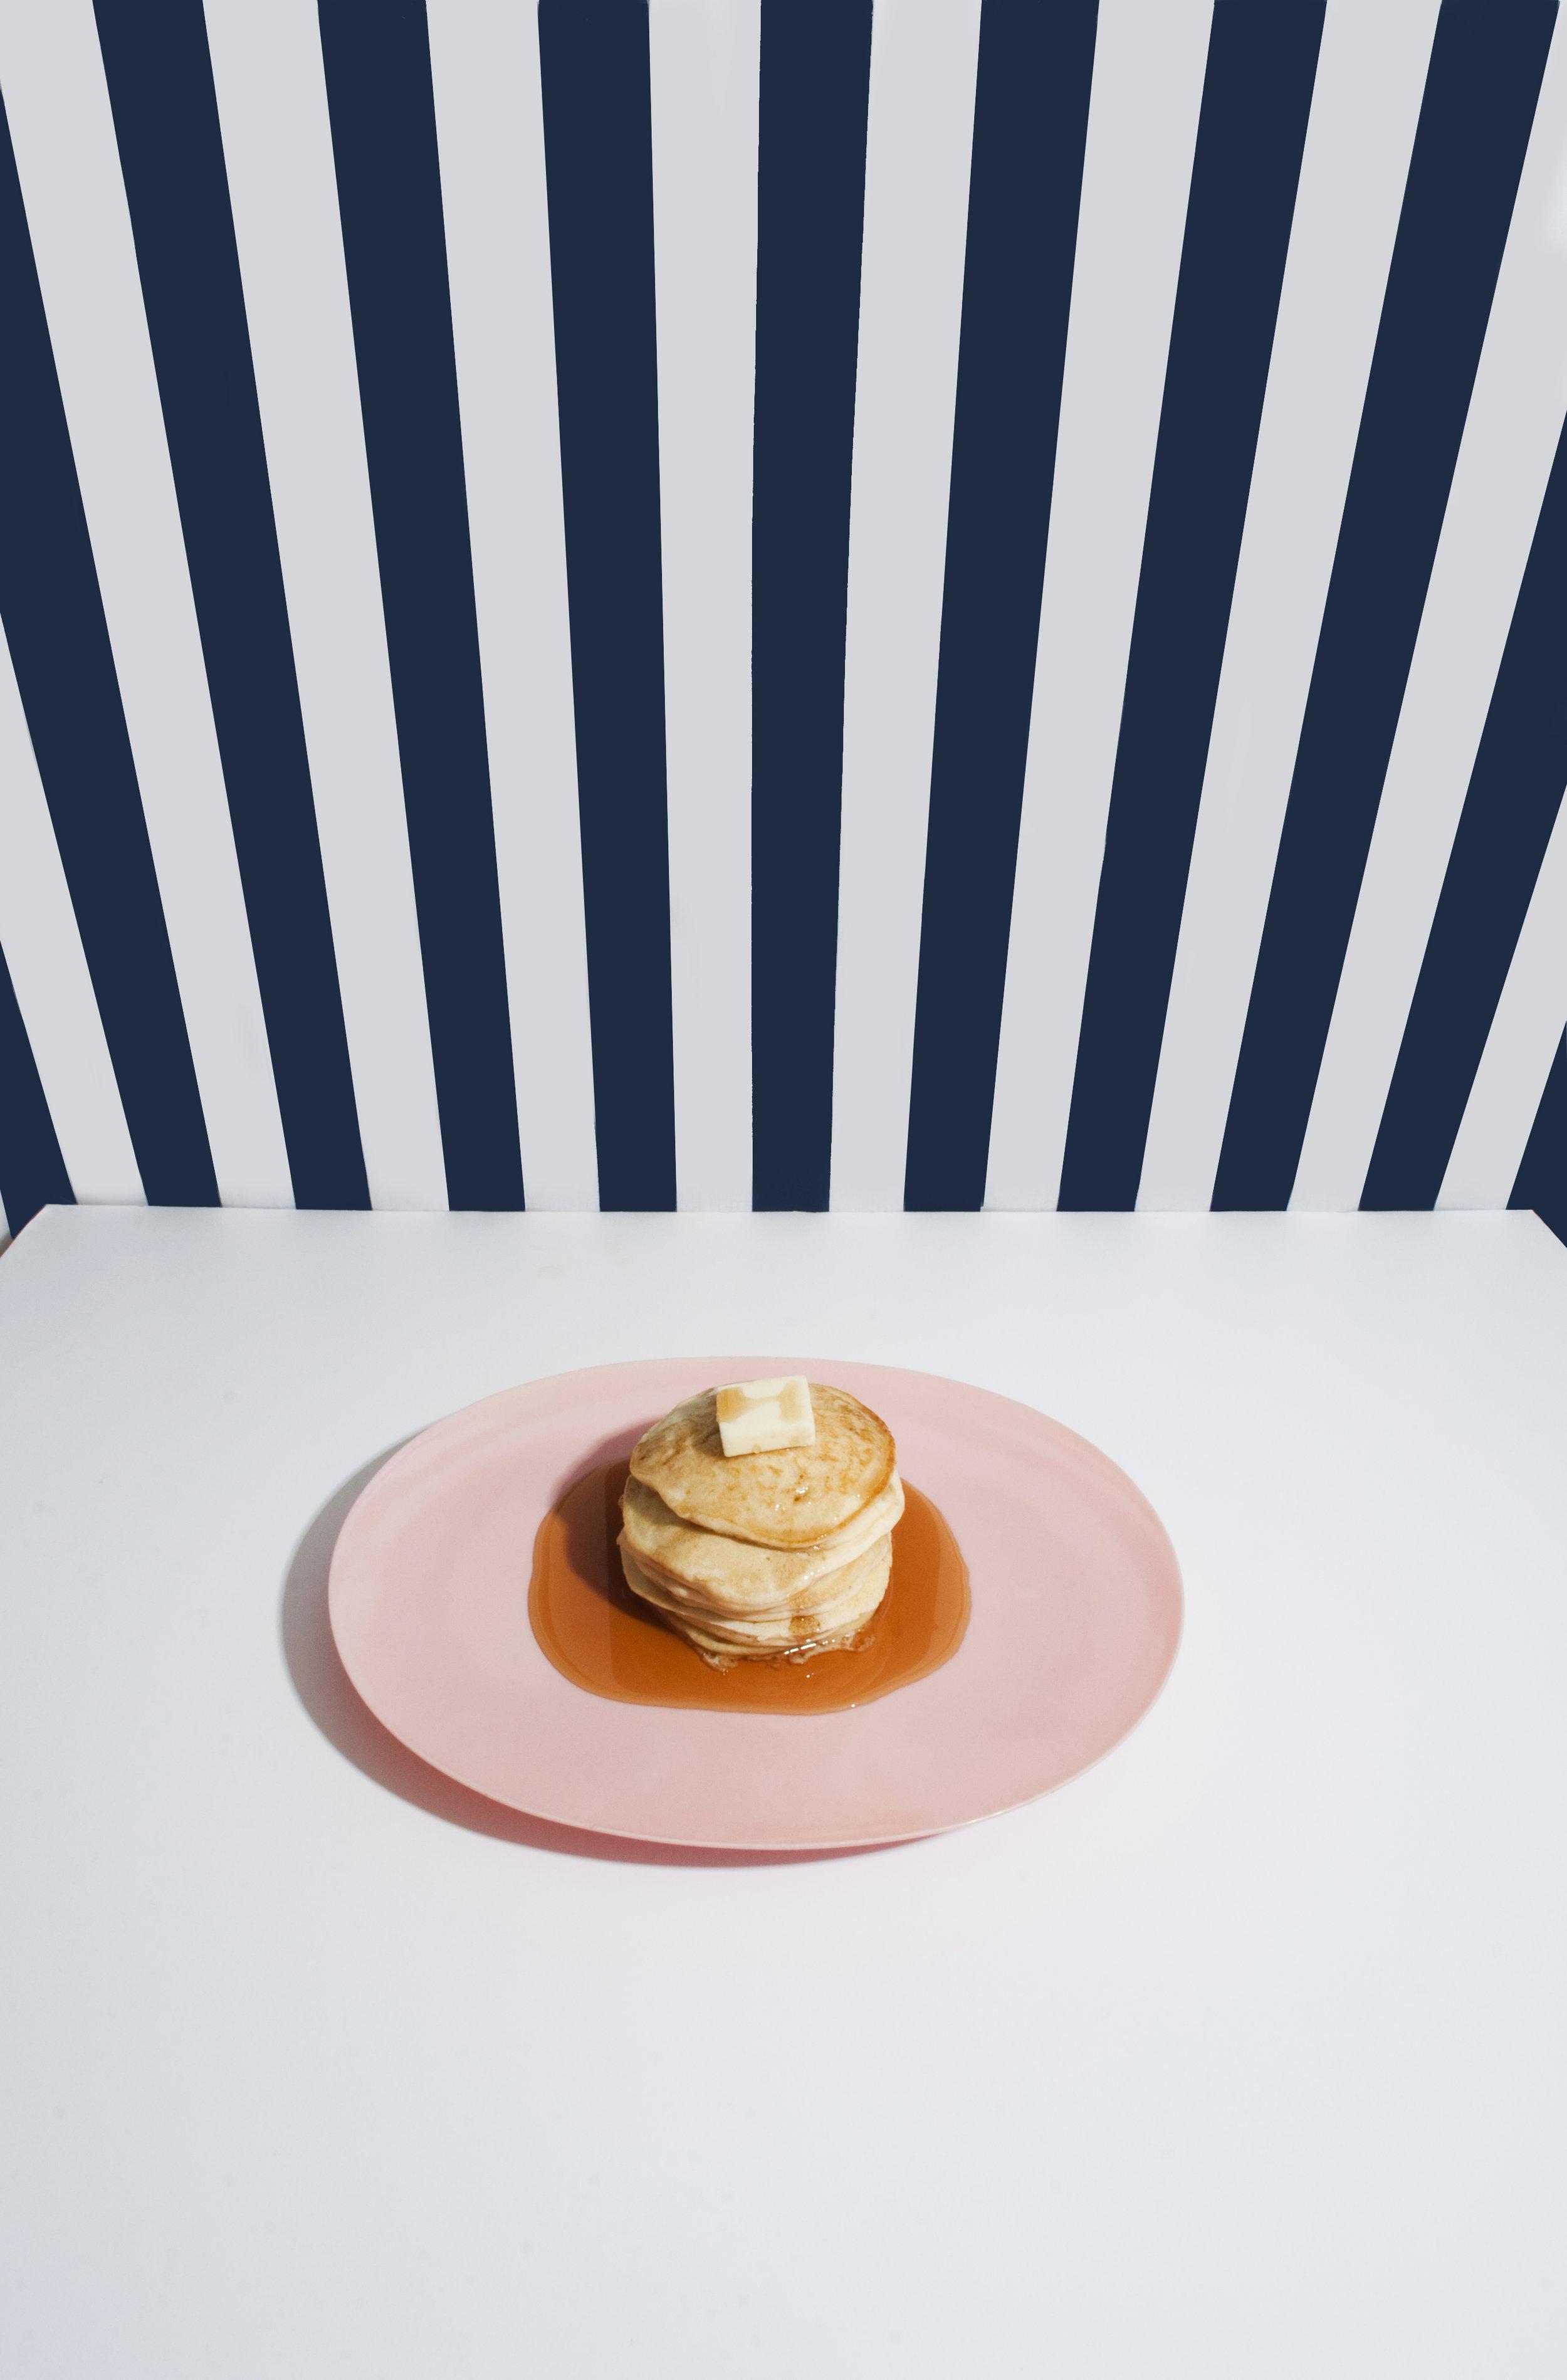 Pancakes copy.jpg